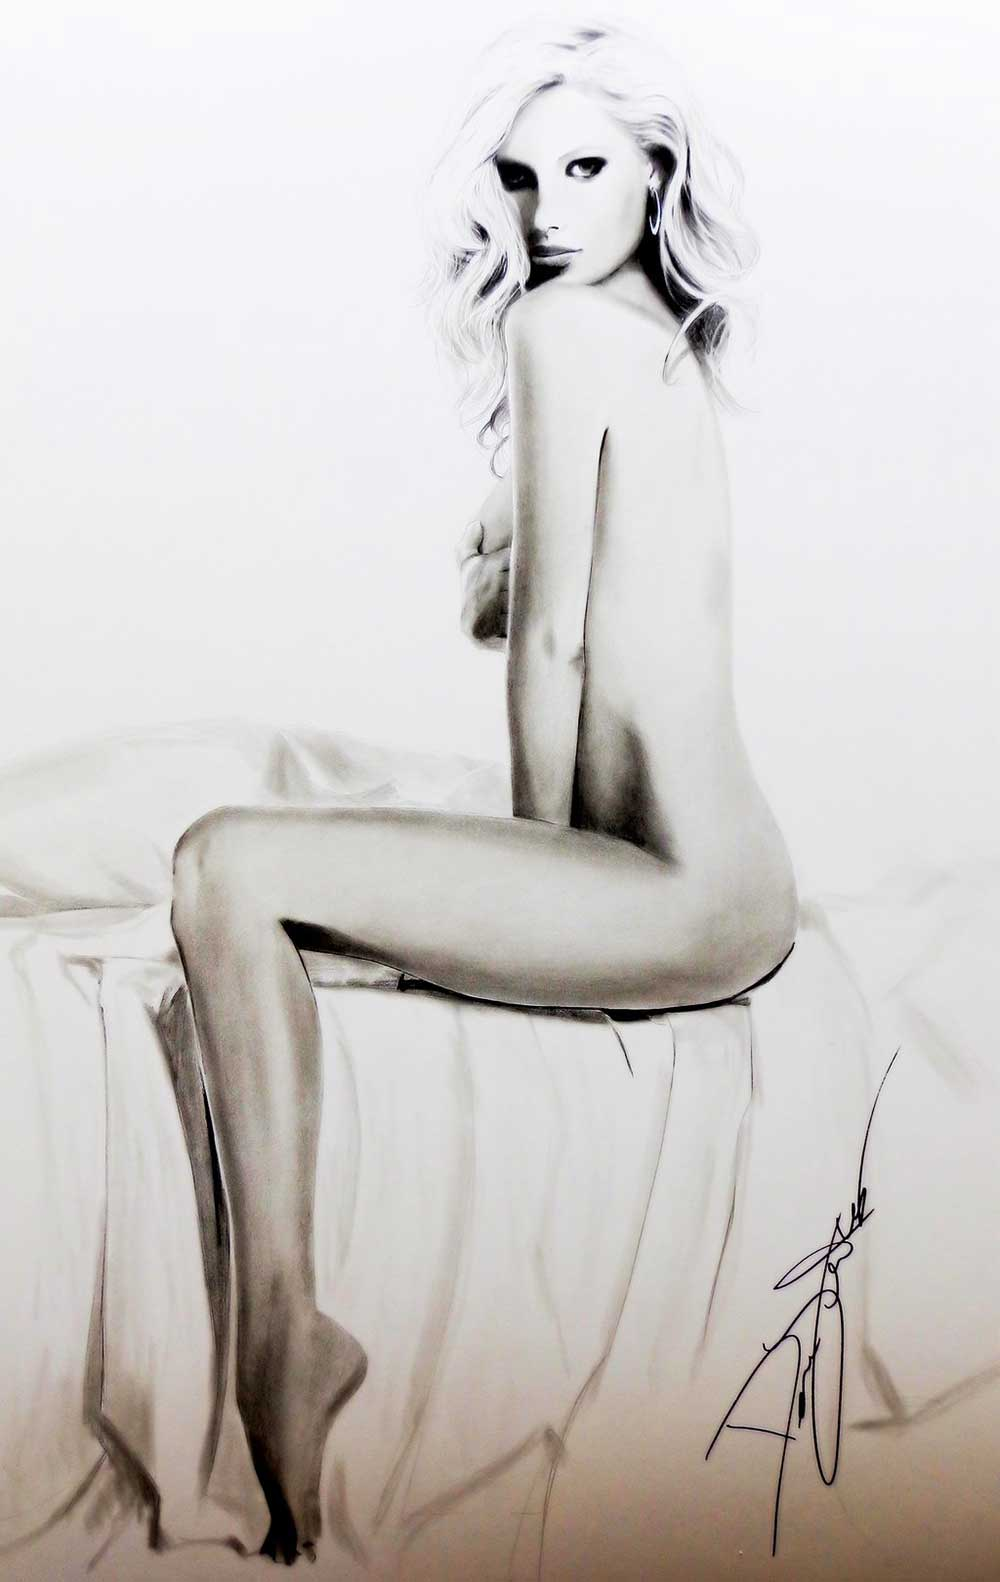 Inspirational Art : Jenn by Dave Lukas